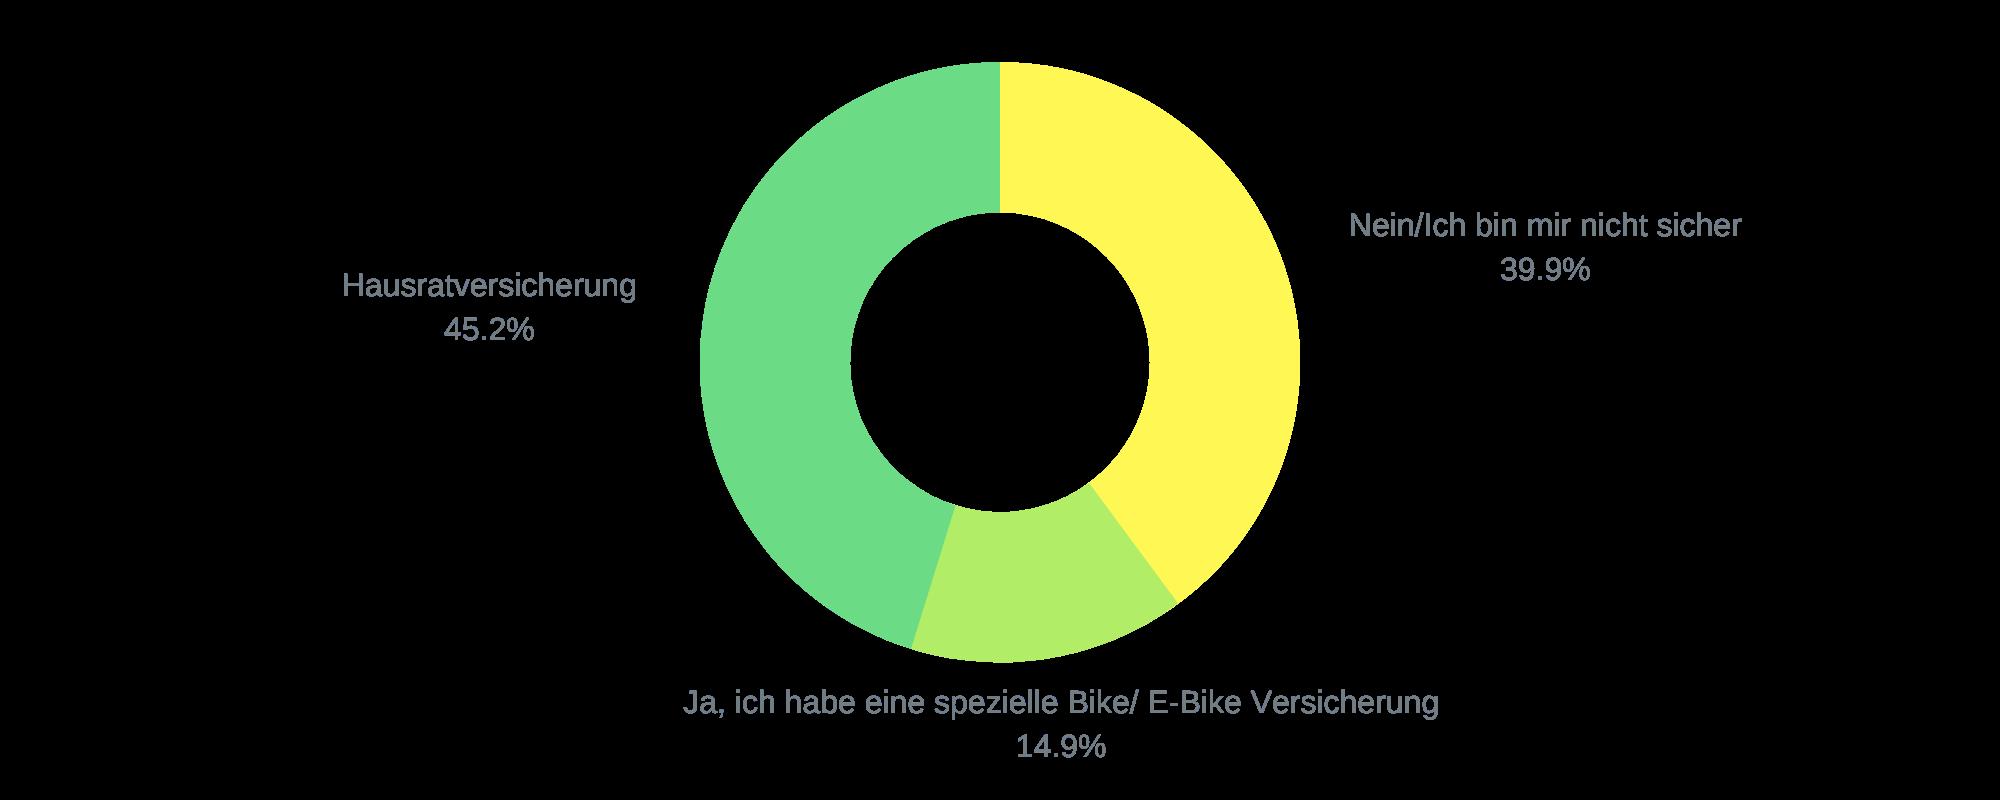 Bikmo Umfrage_E-Bike Versicherung